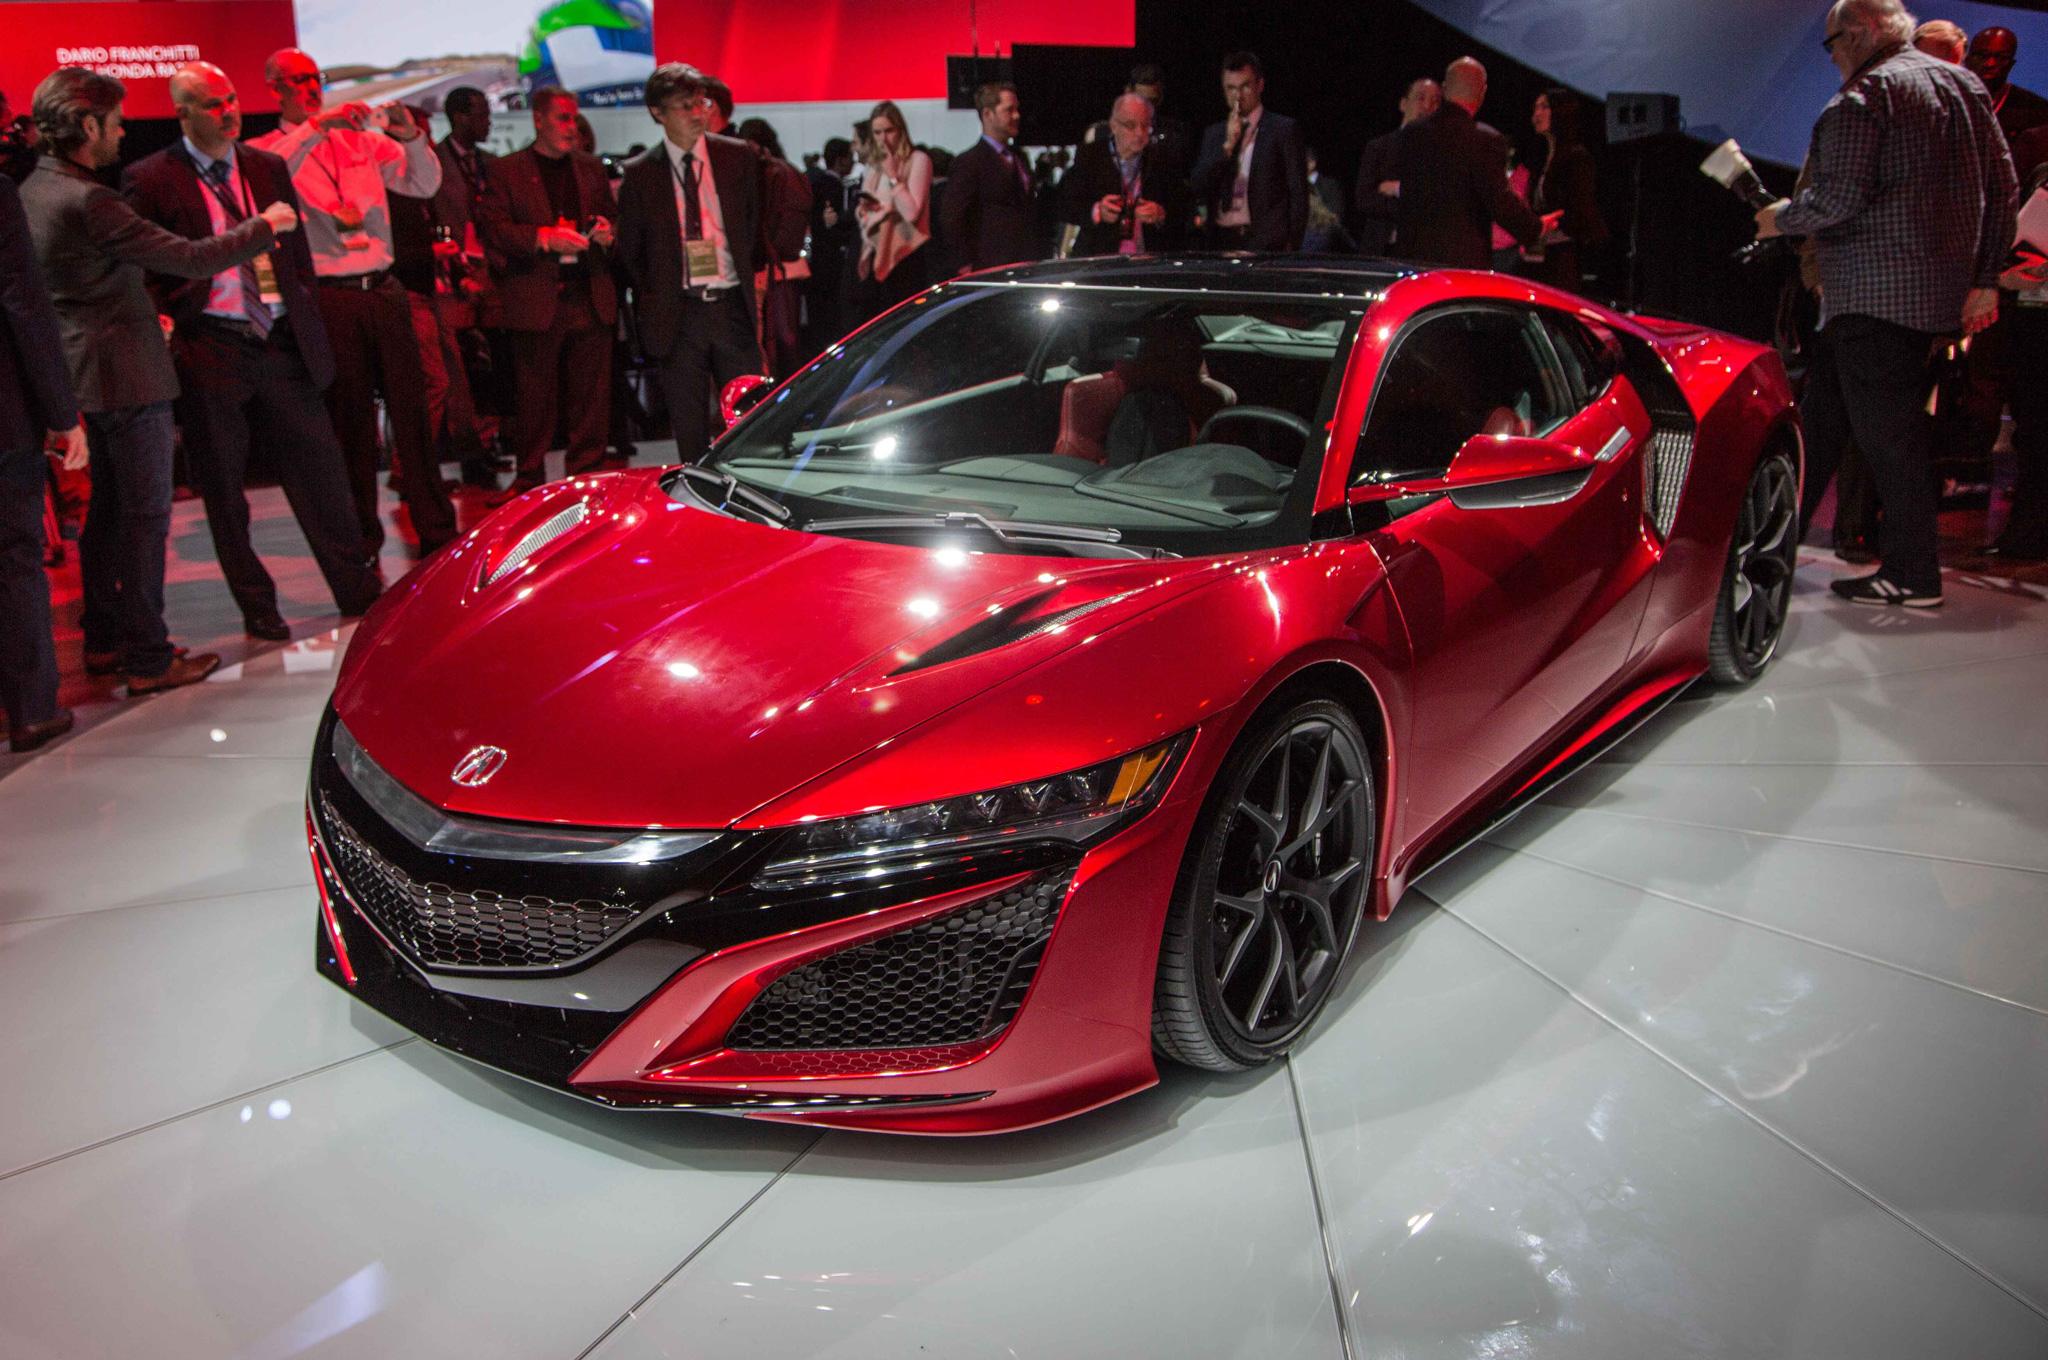 2016 Acura NSX Exterior Profile Auto Show